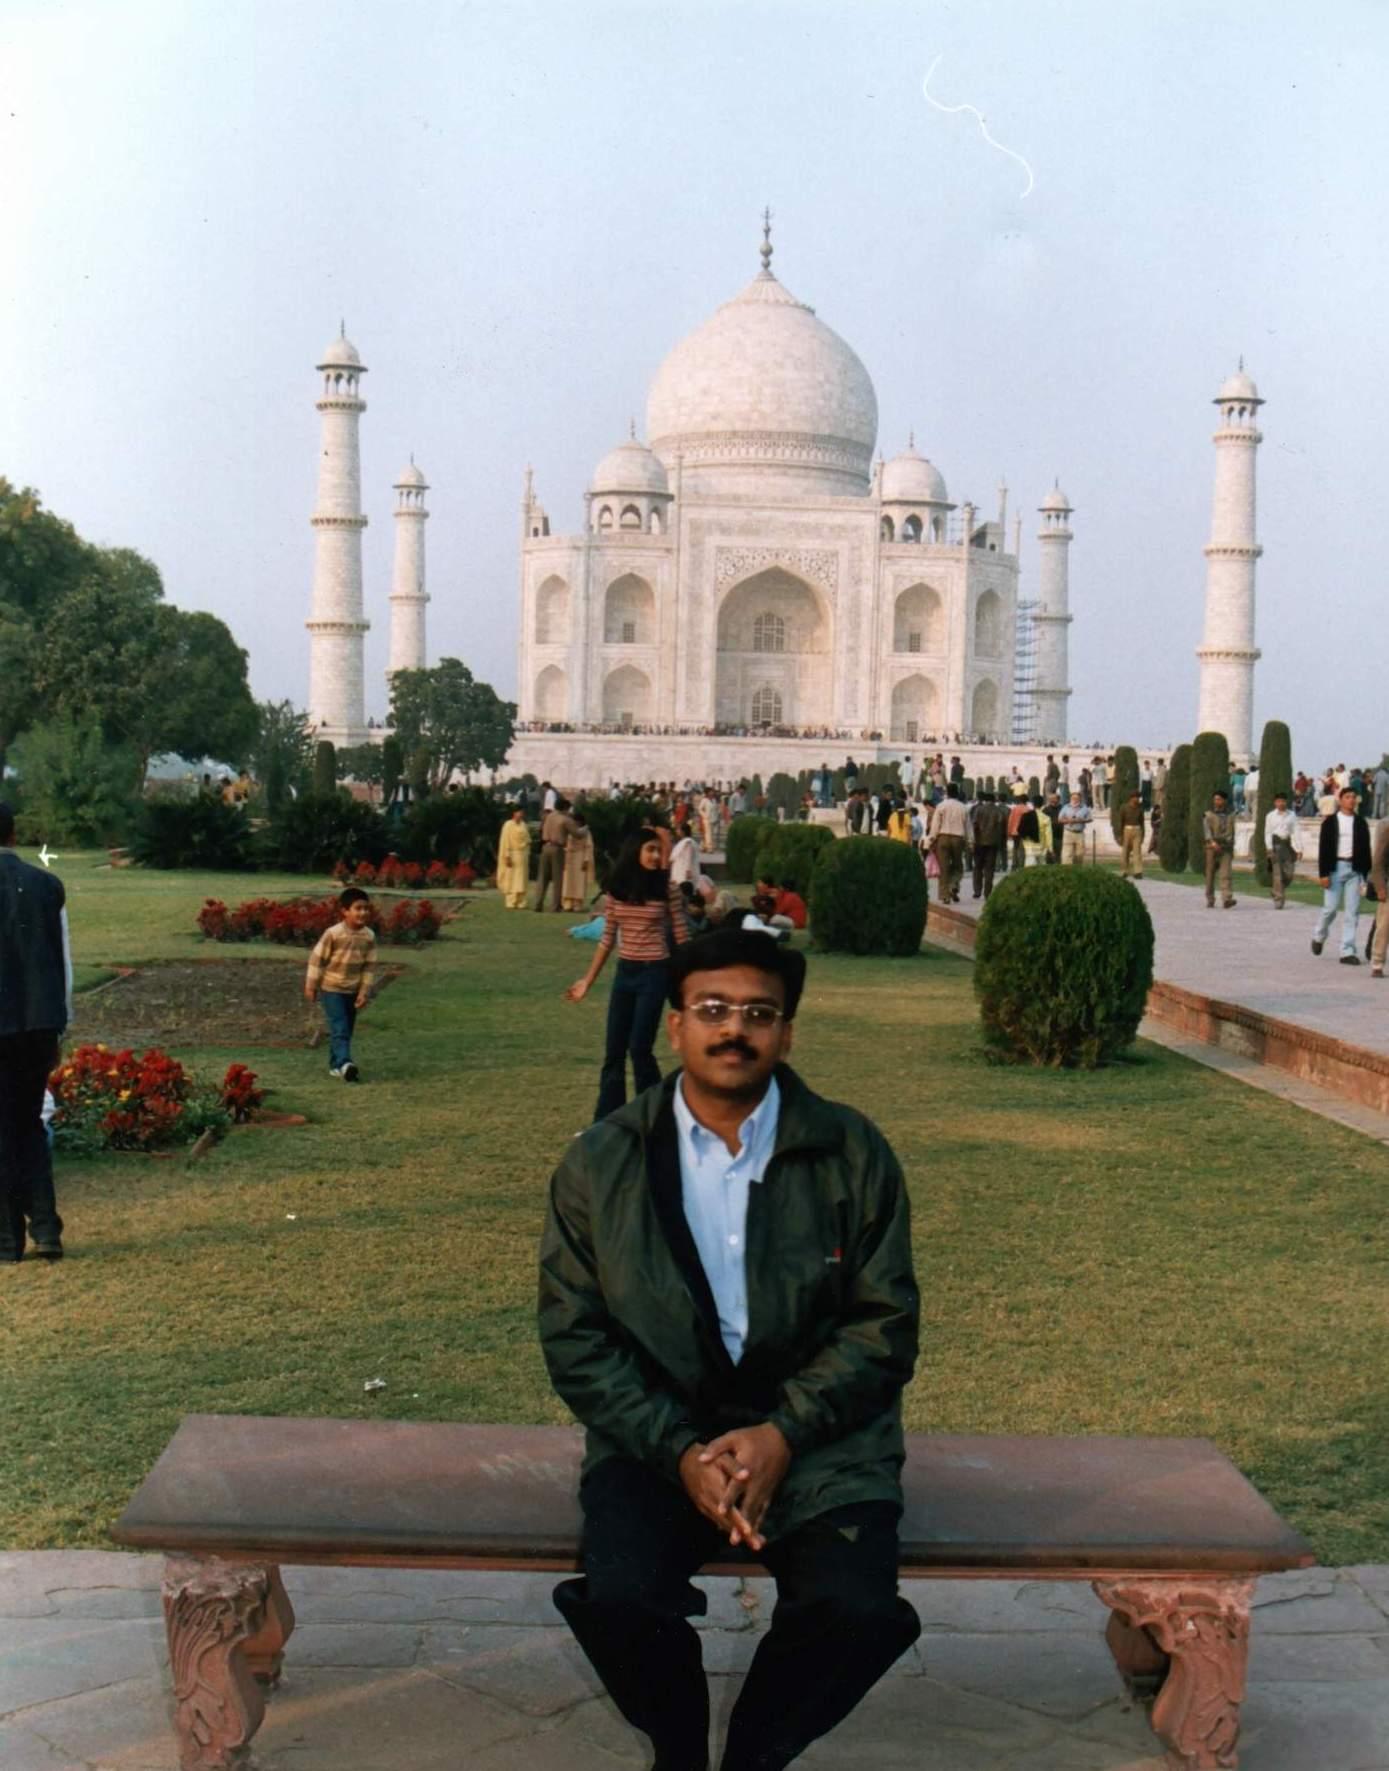 Taj Mahal 2003 Taj Mahal - India Senthildurai